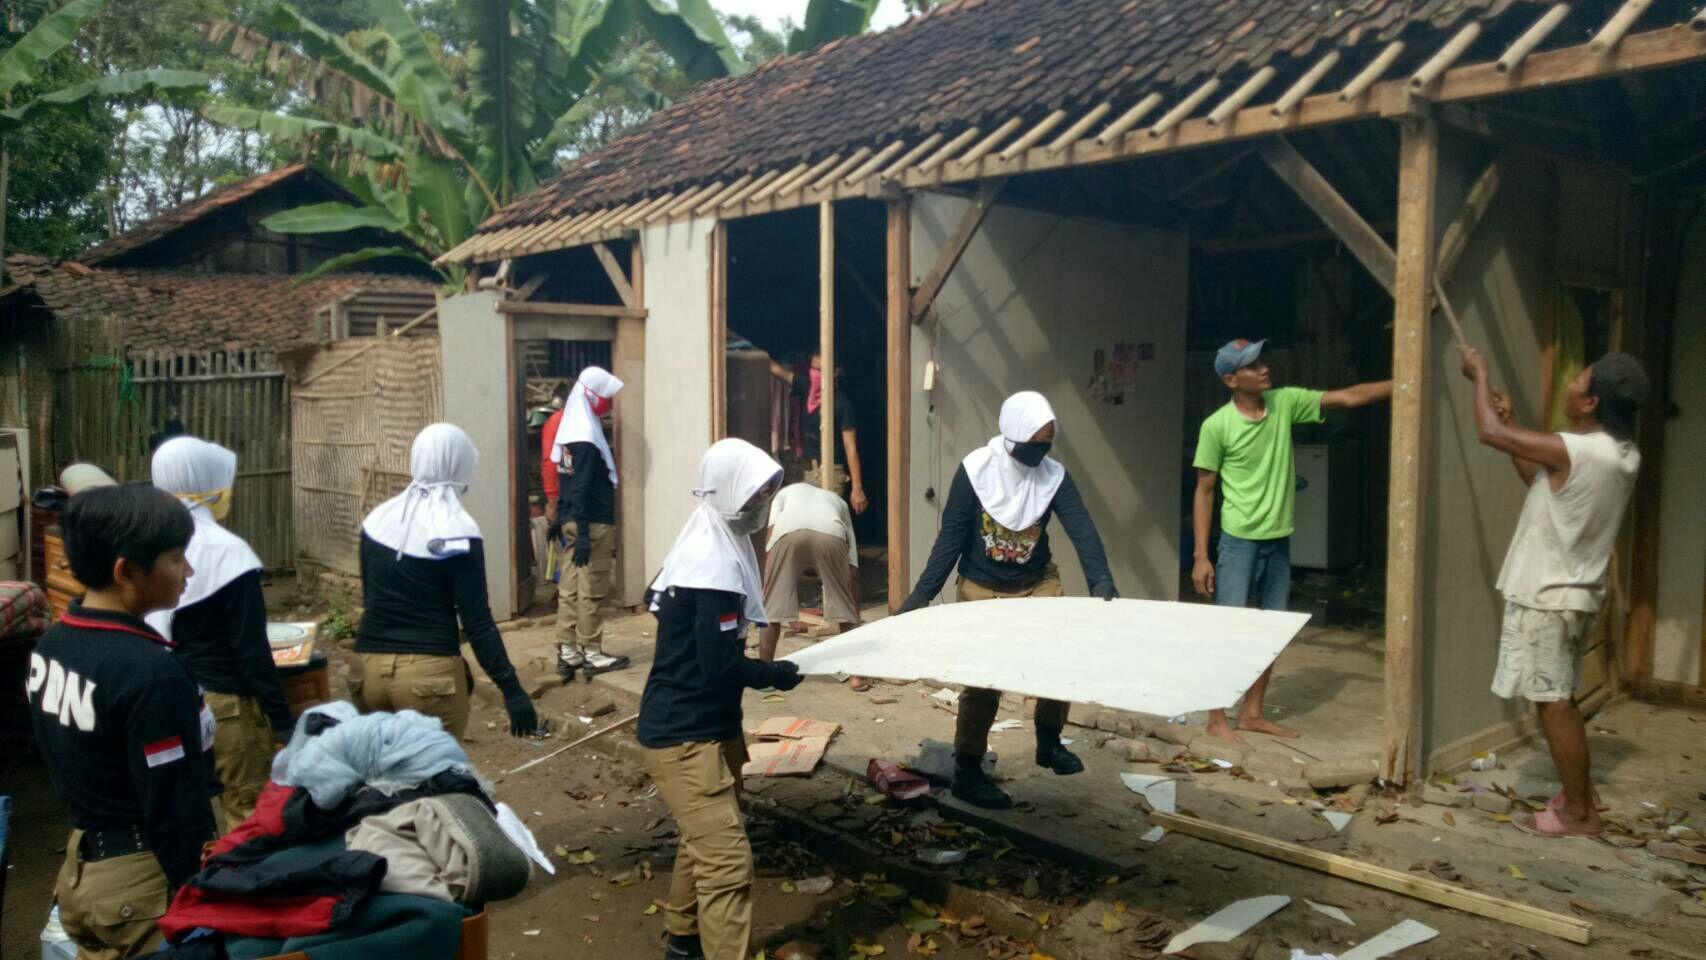 Bedah Rumah KUKERTA IPDN Wilayah Kecamatan Ampelgading